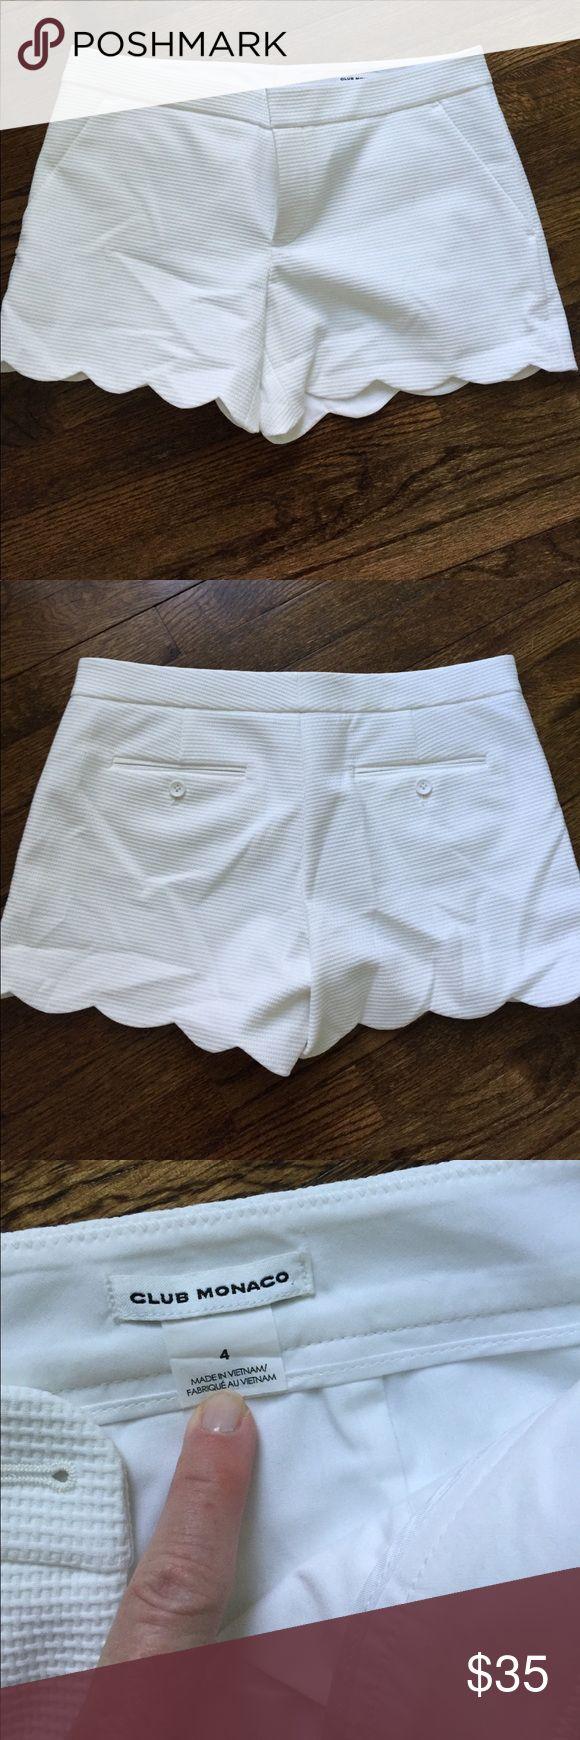 Club Monaco white shorts Club Monaco white shorts Club Monaco Shorts